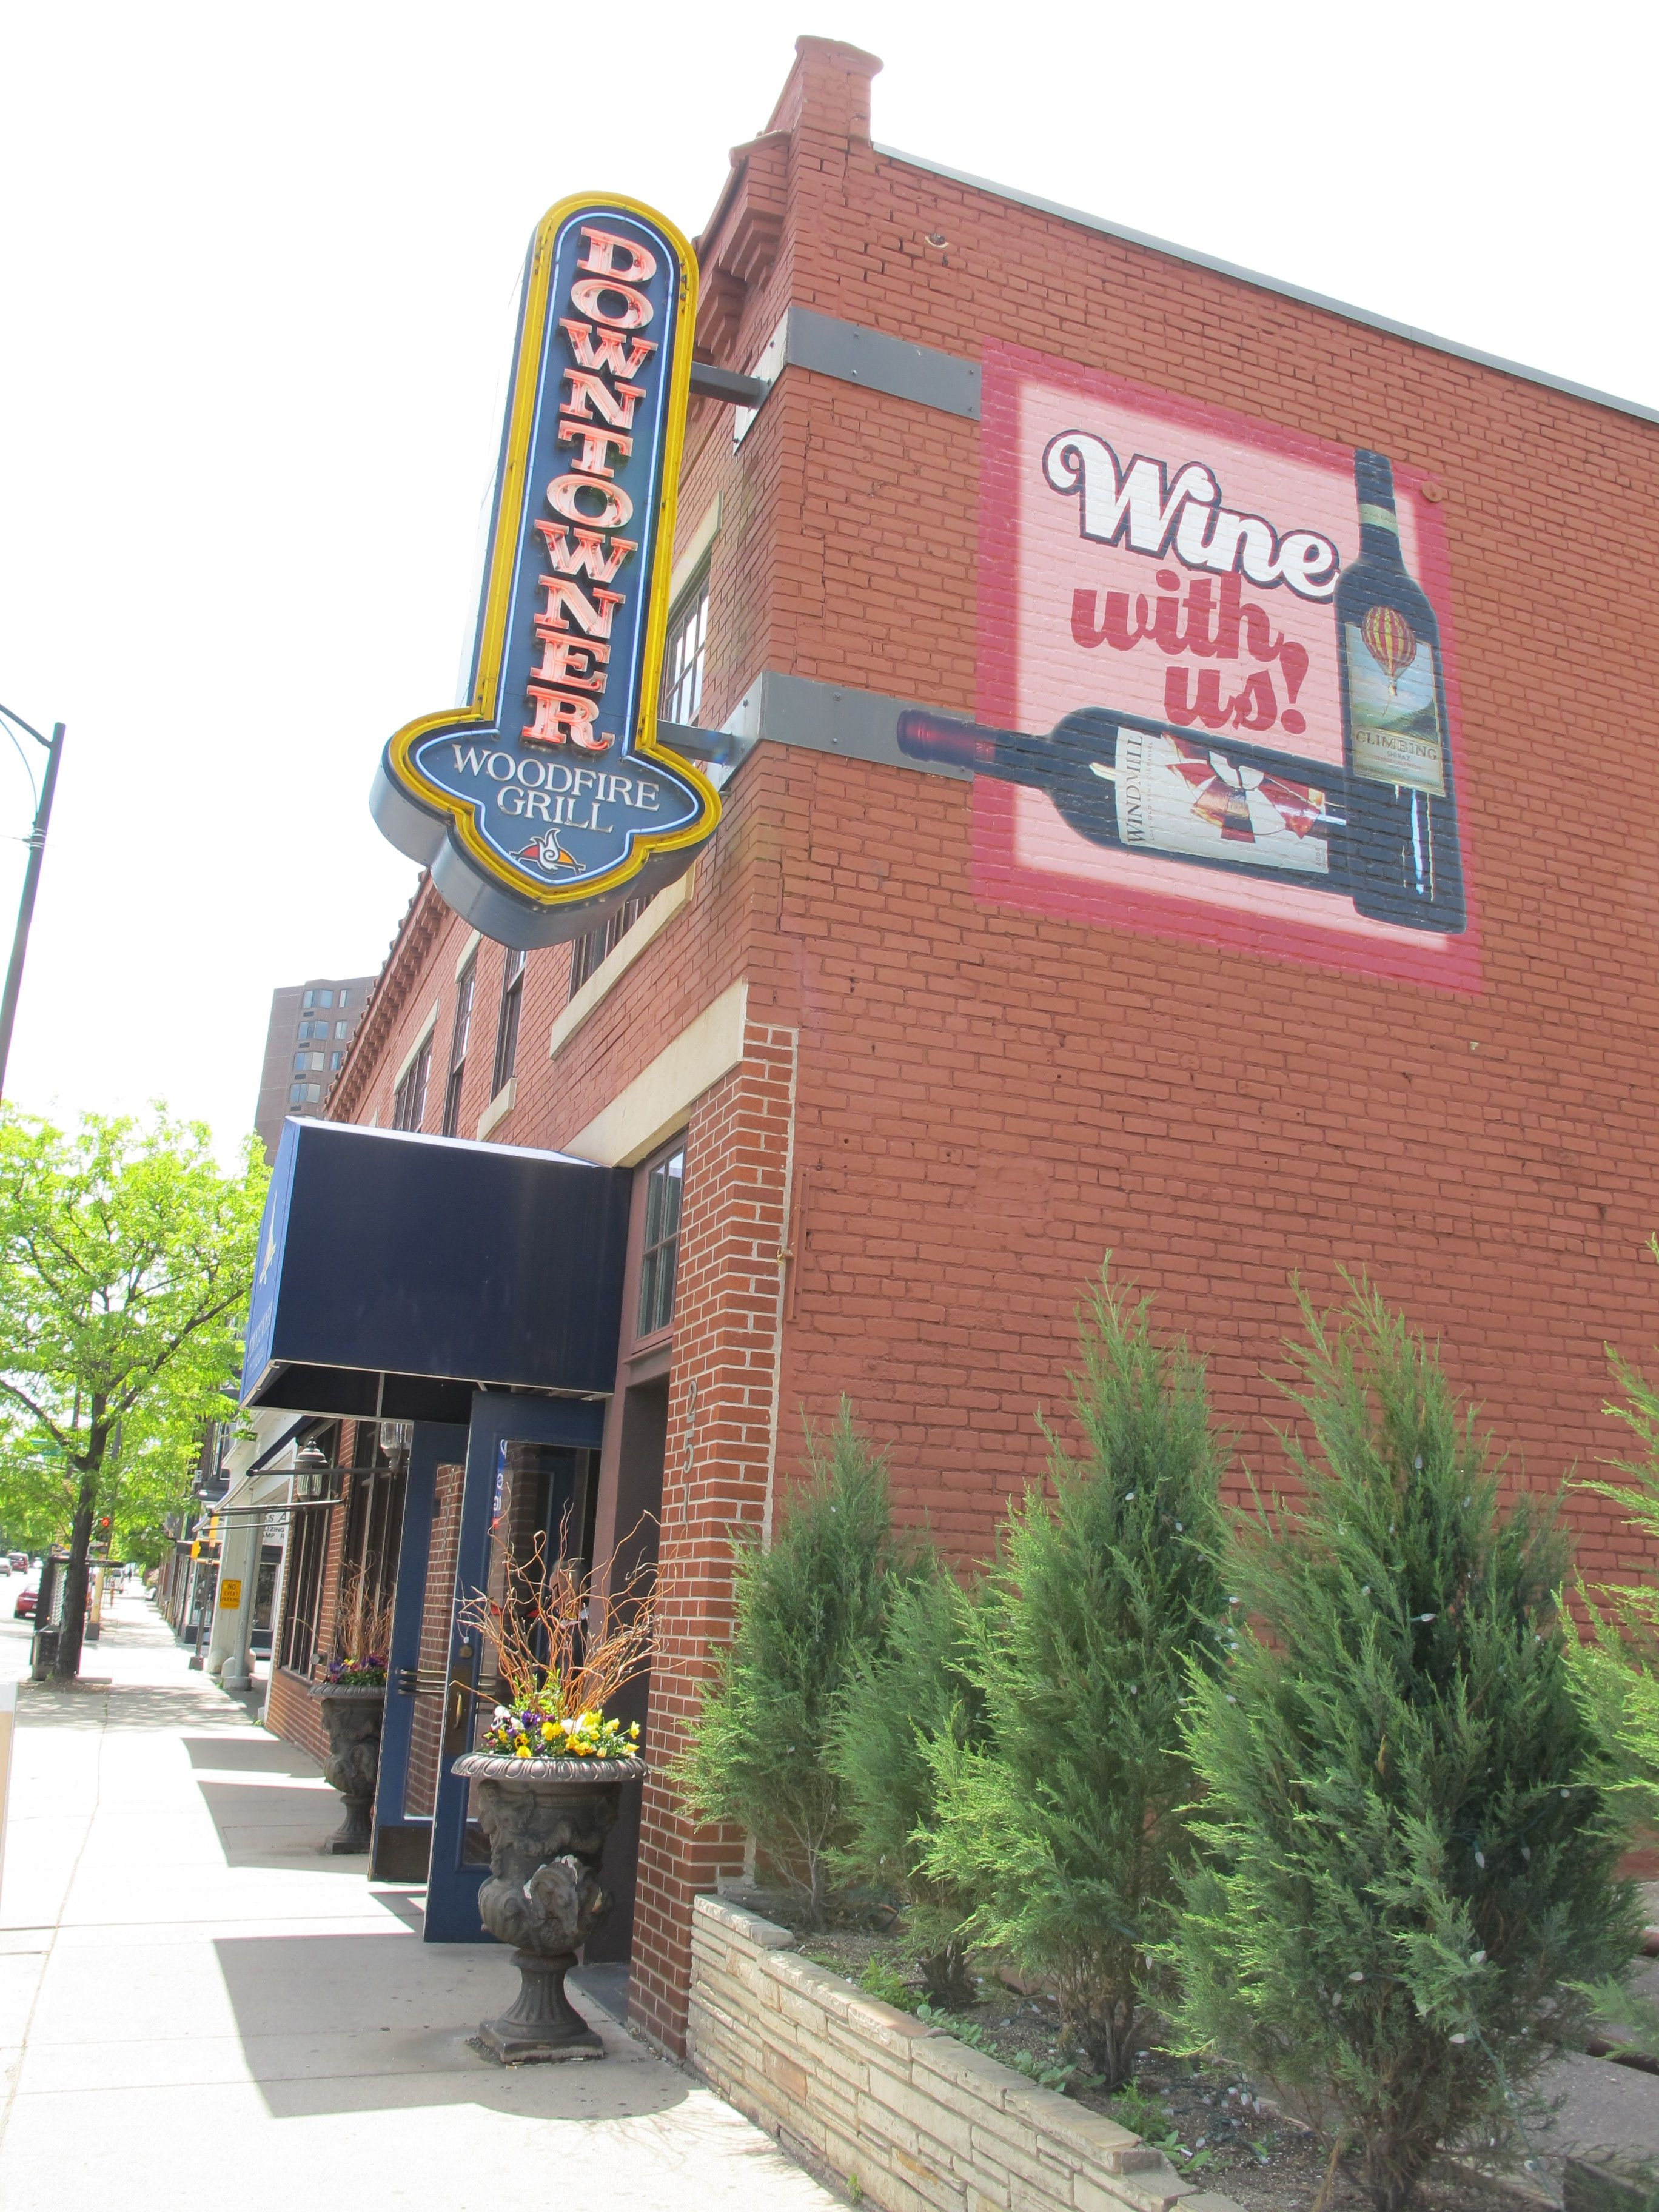 Downtowner Woodfire Grill Minnesota Saint Paul Restaurant Wordpress Themes